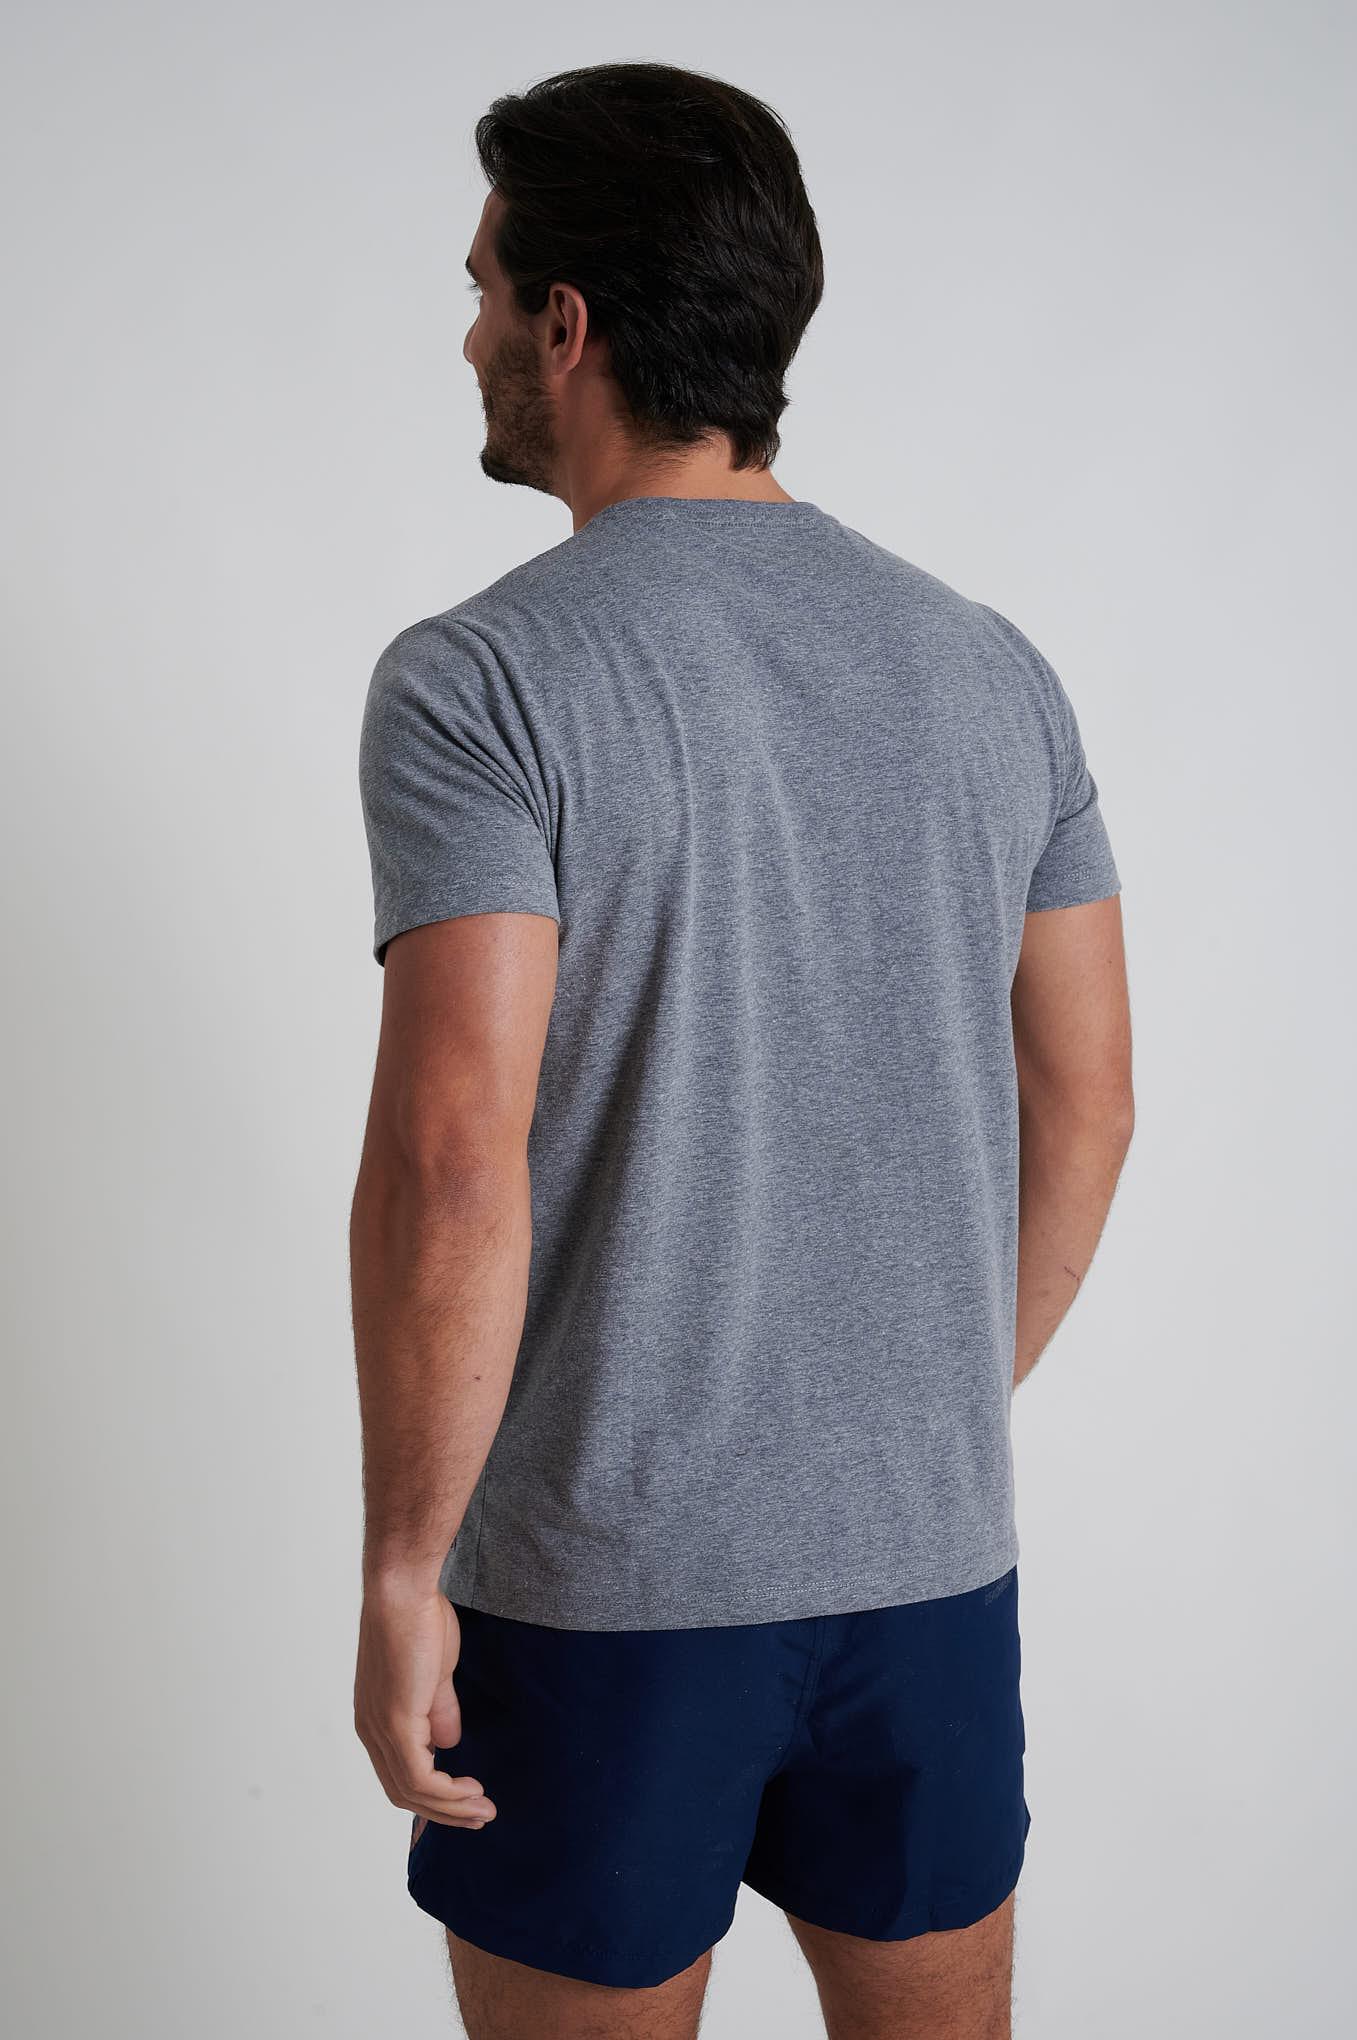 T-Shirt Dark Grey Sport Man